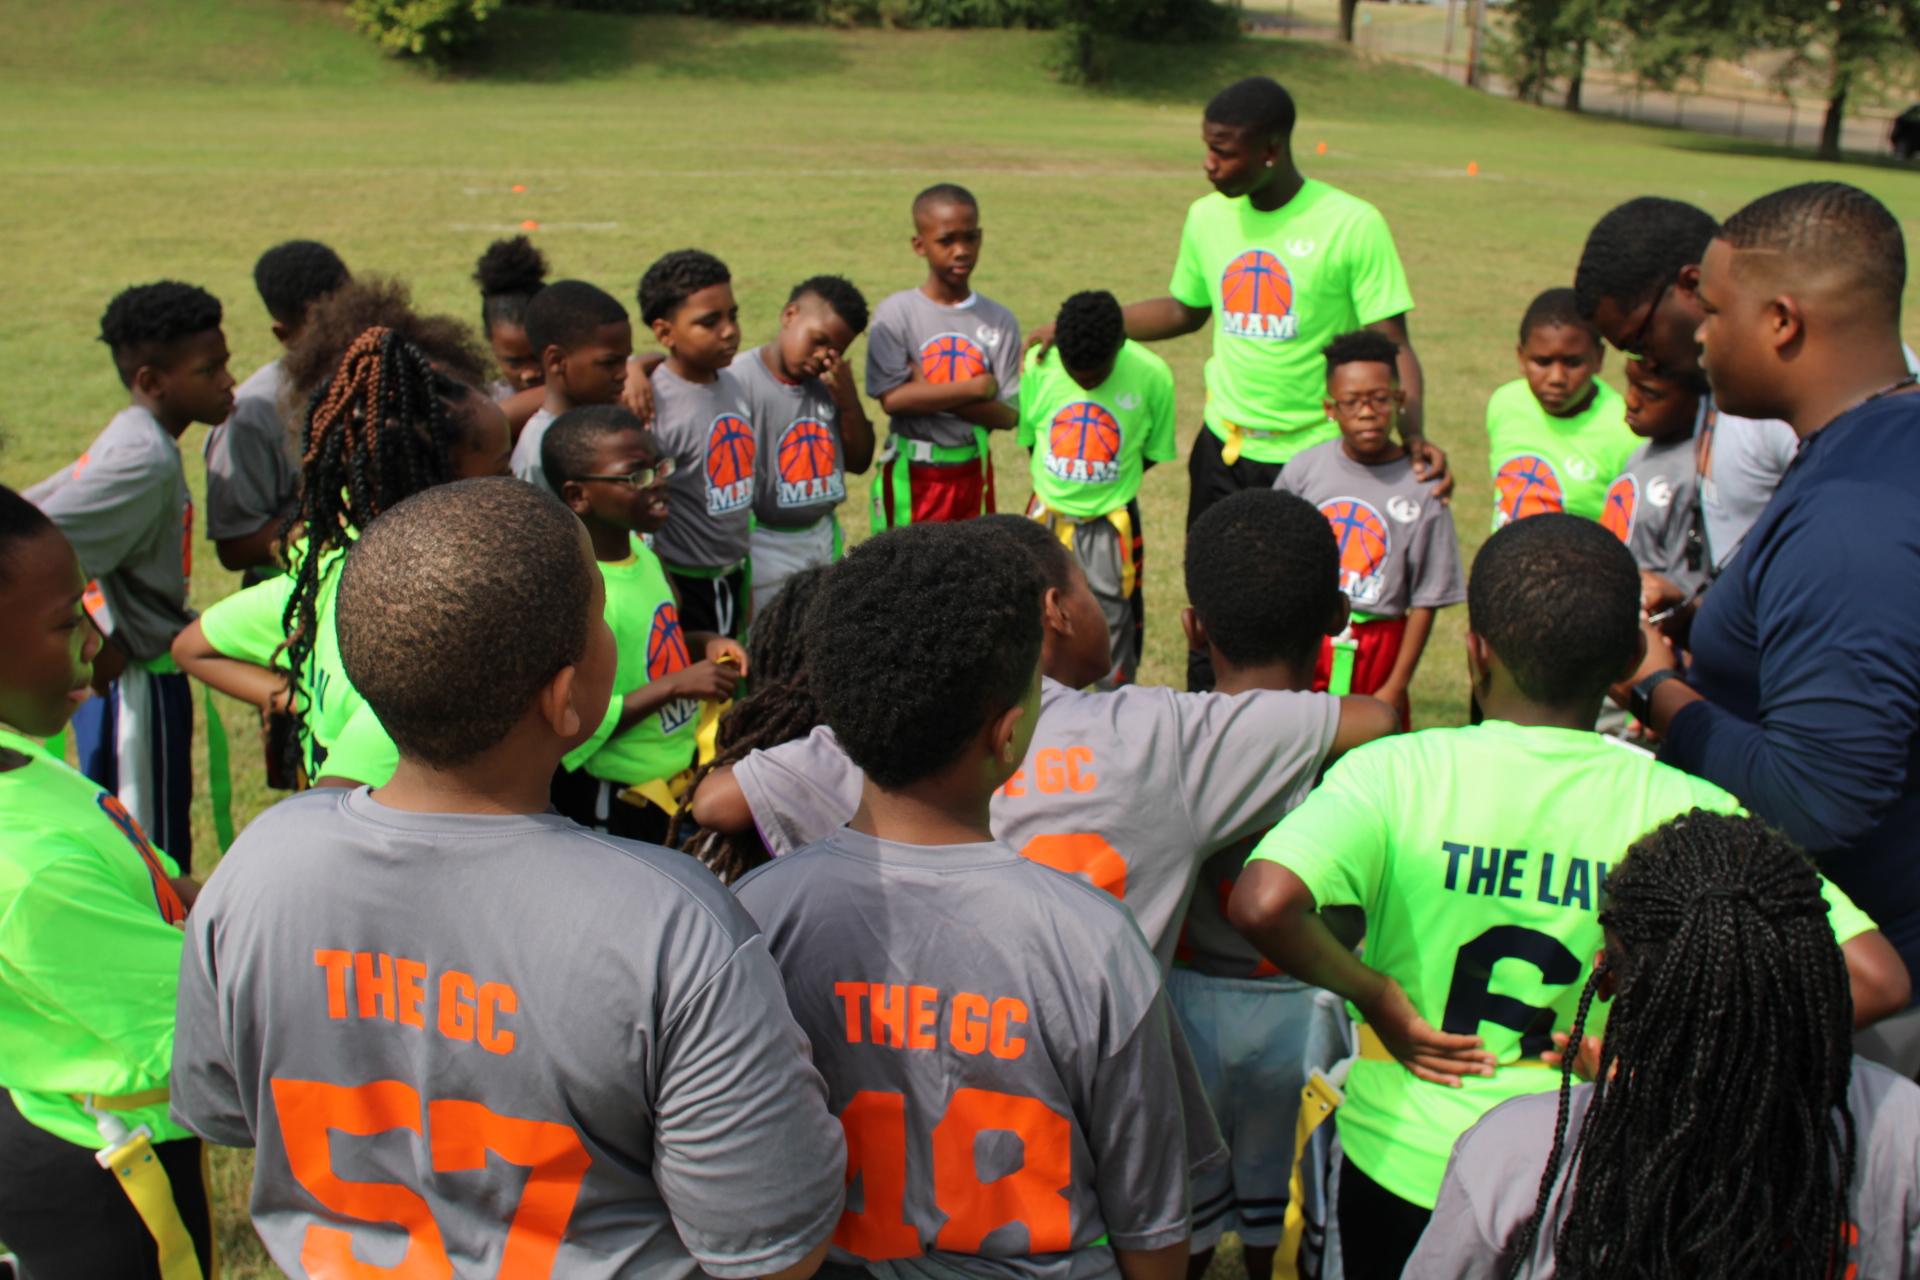 MAM dedicates flag football season in memory of Brandon Archer, MAM youth coordinator